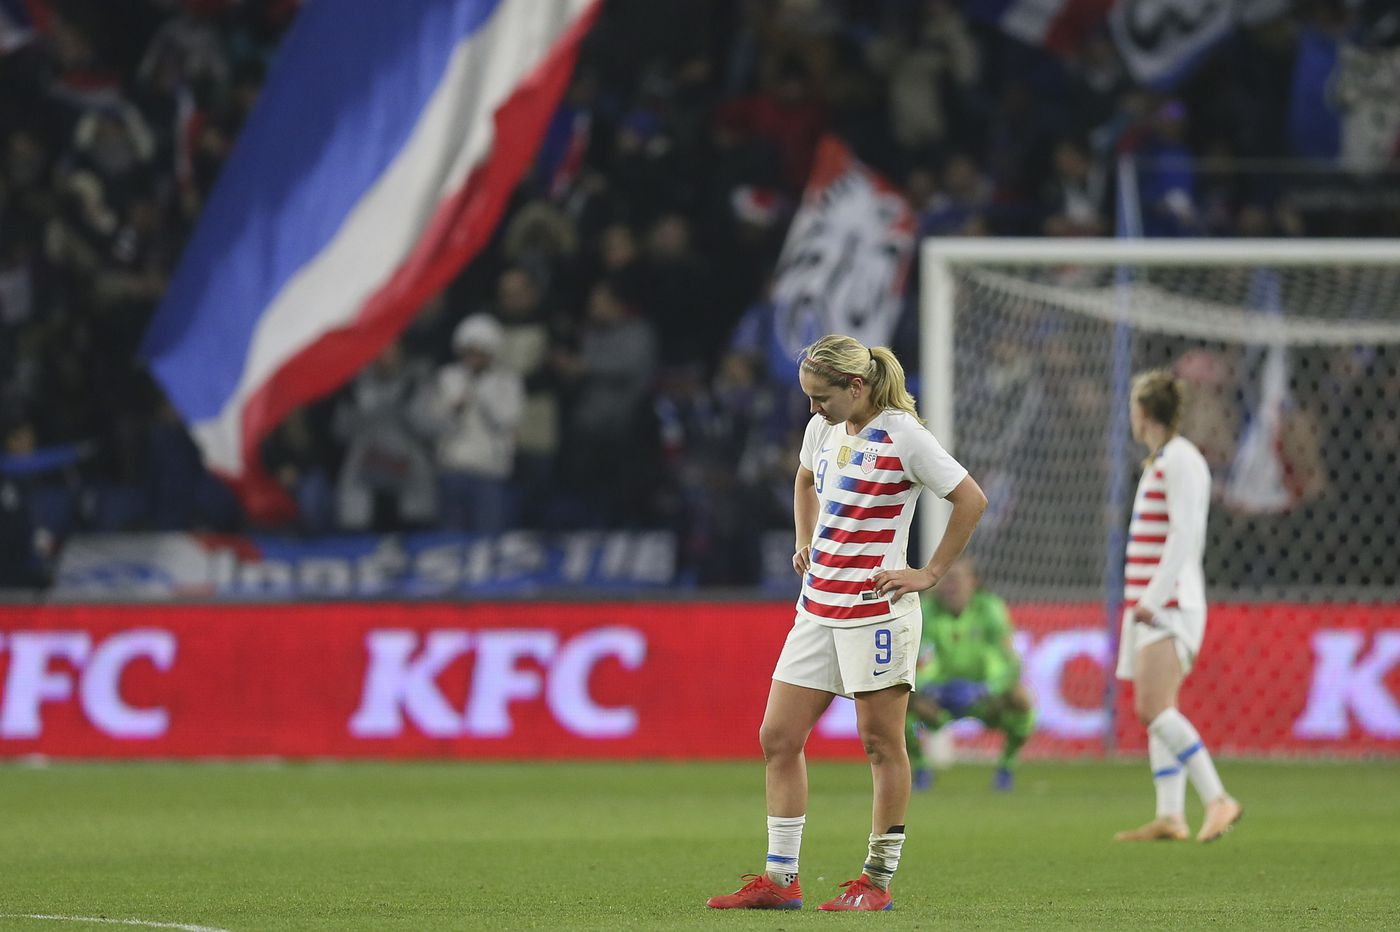 Jill Ellis on U.S. women's soccer team's loss to France: 'We will improve'